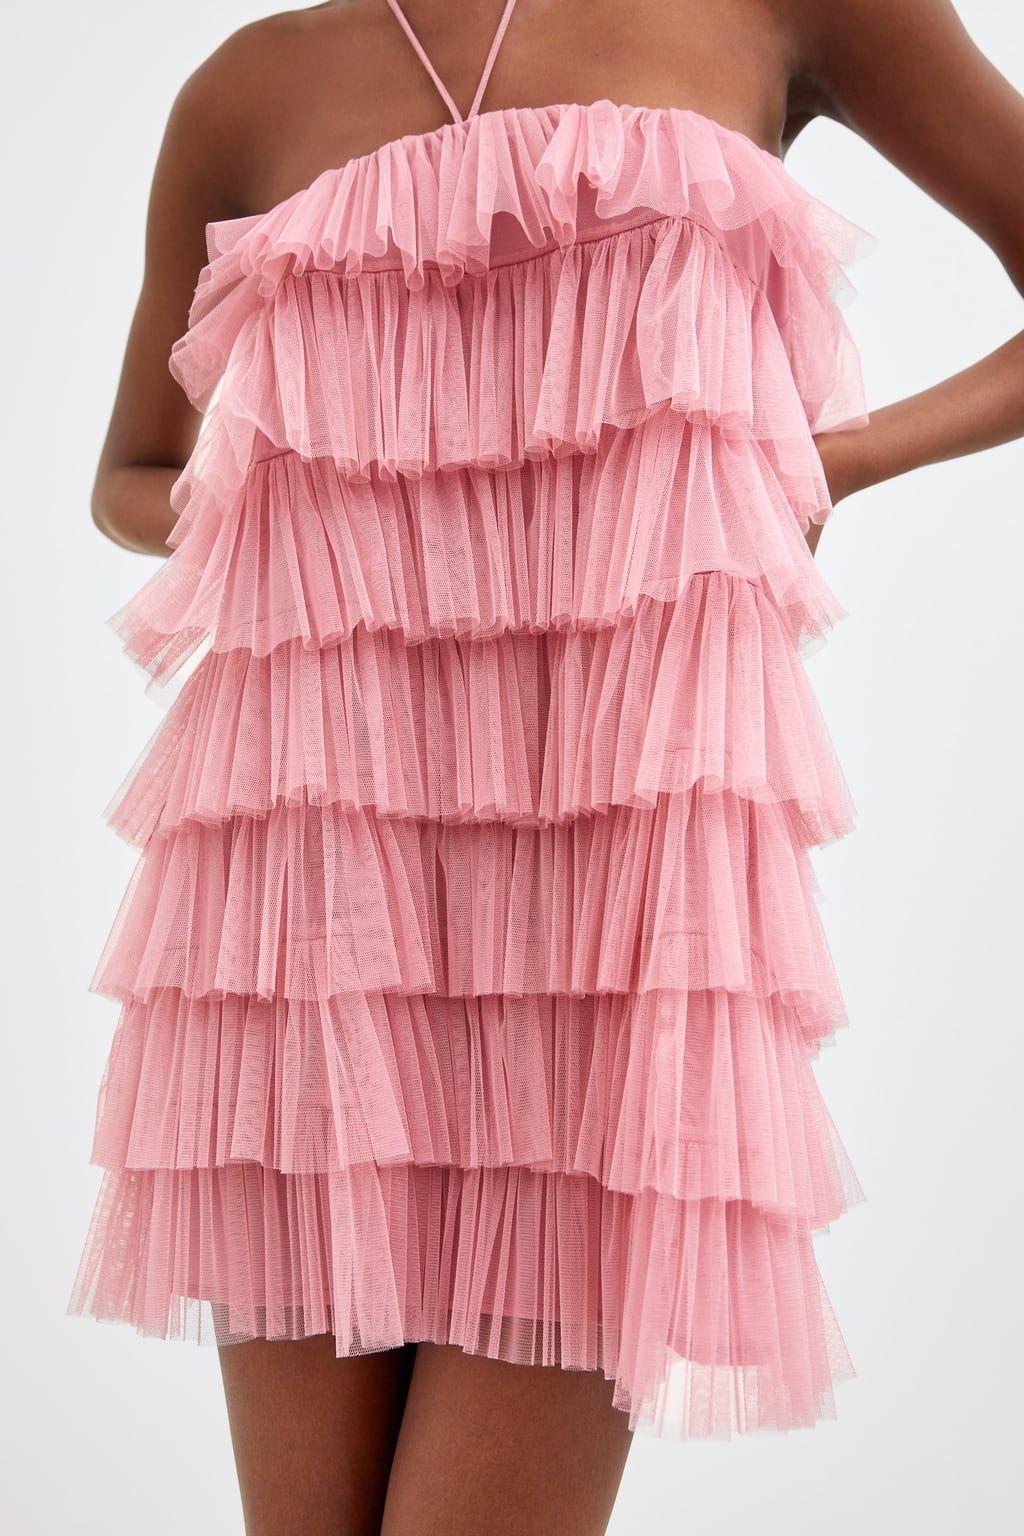 limited edition ruffled tulle dress   tulle, vestiti, volant